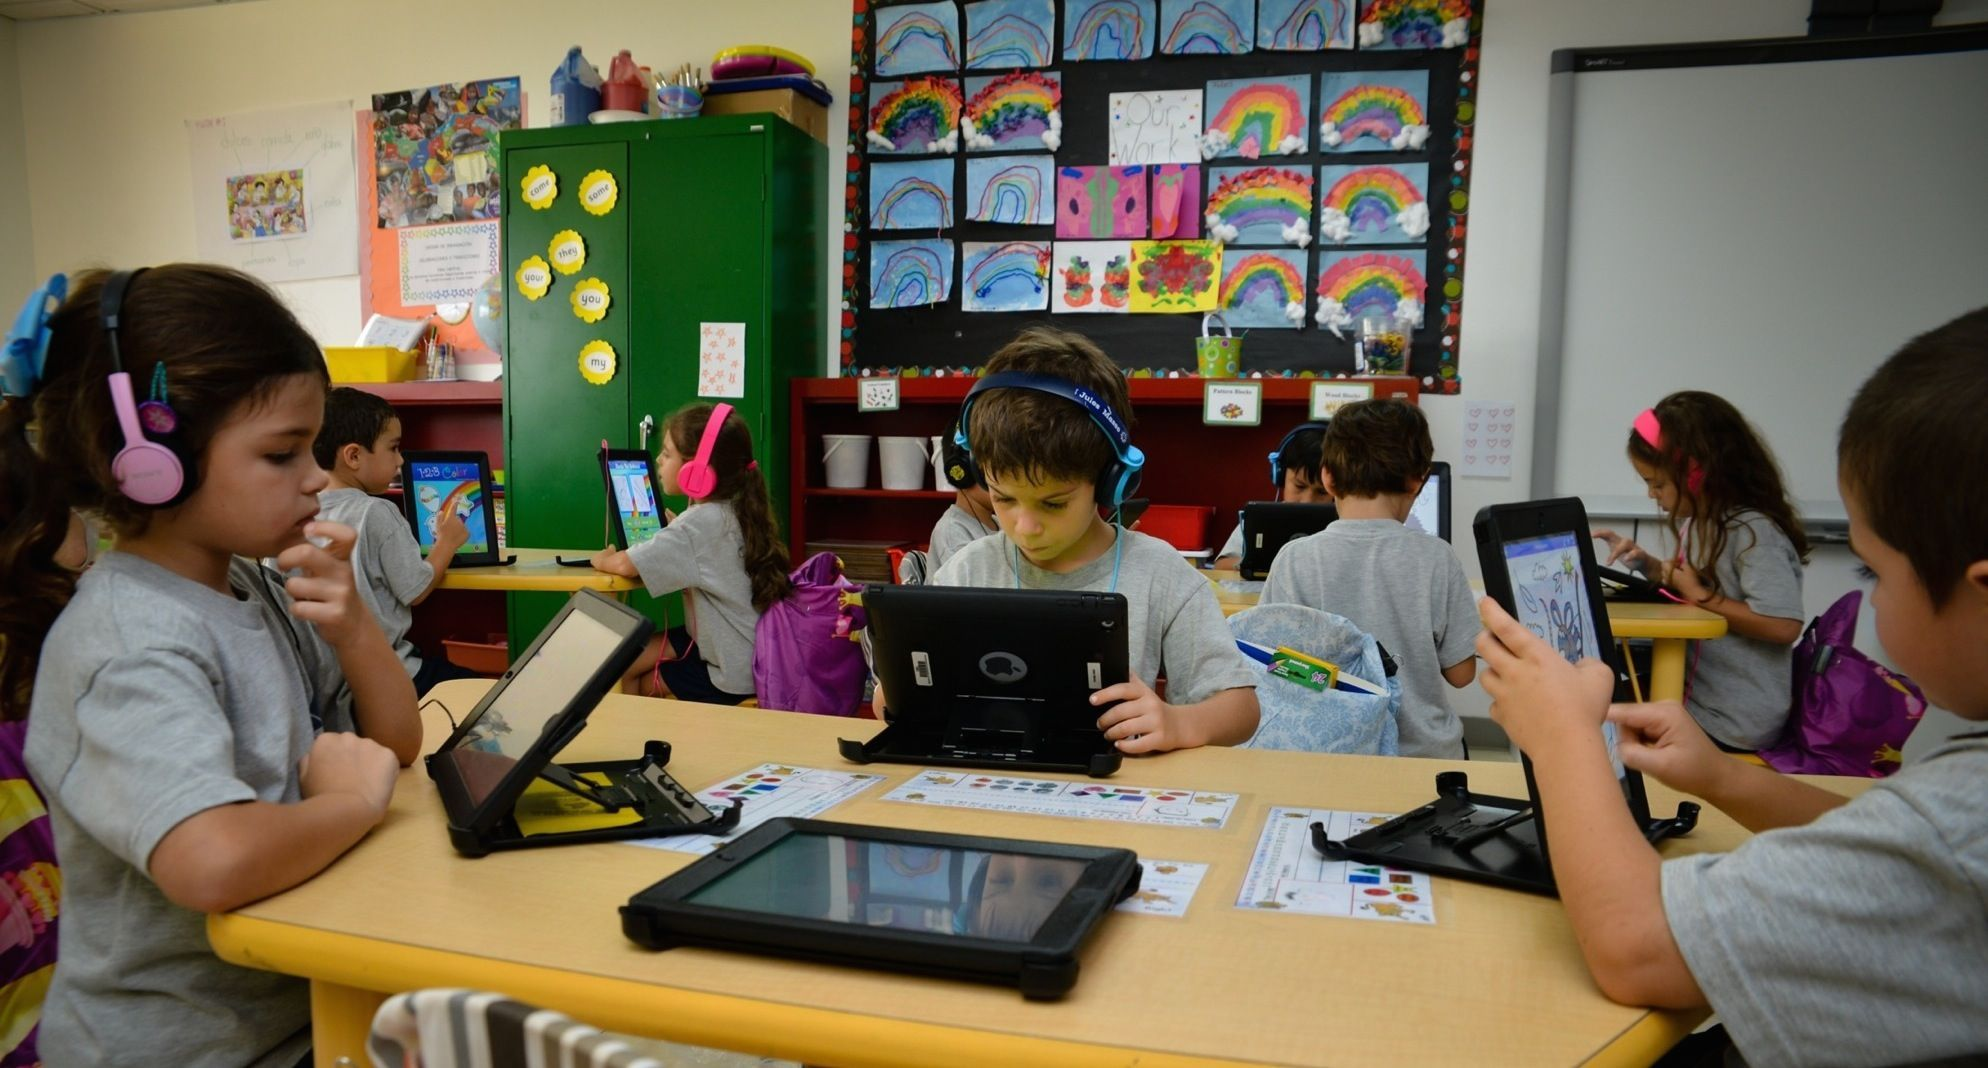 Evolución De La Tecnología Educativa Como Disciplina Pedagógica Ebook Educational Technology Education Gadget Education